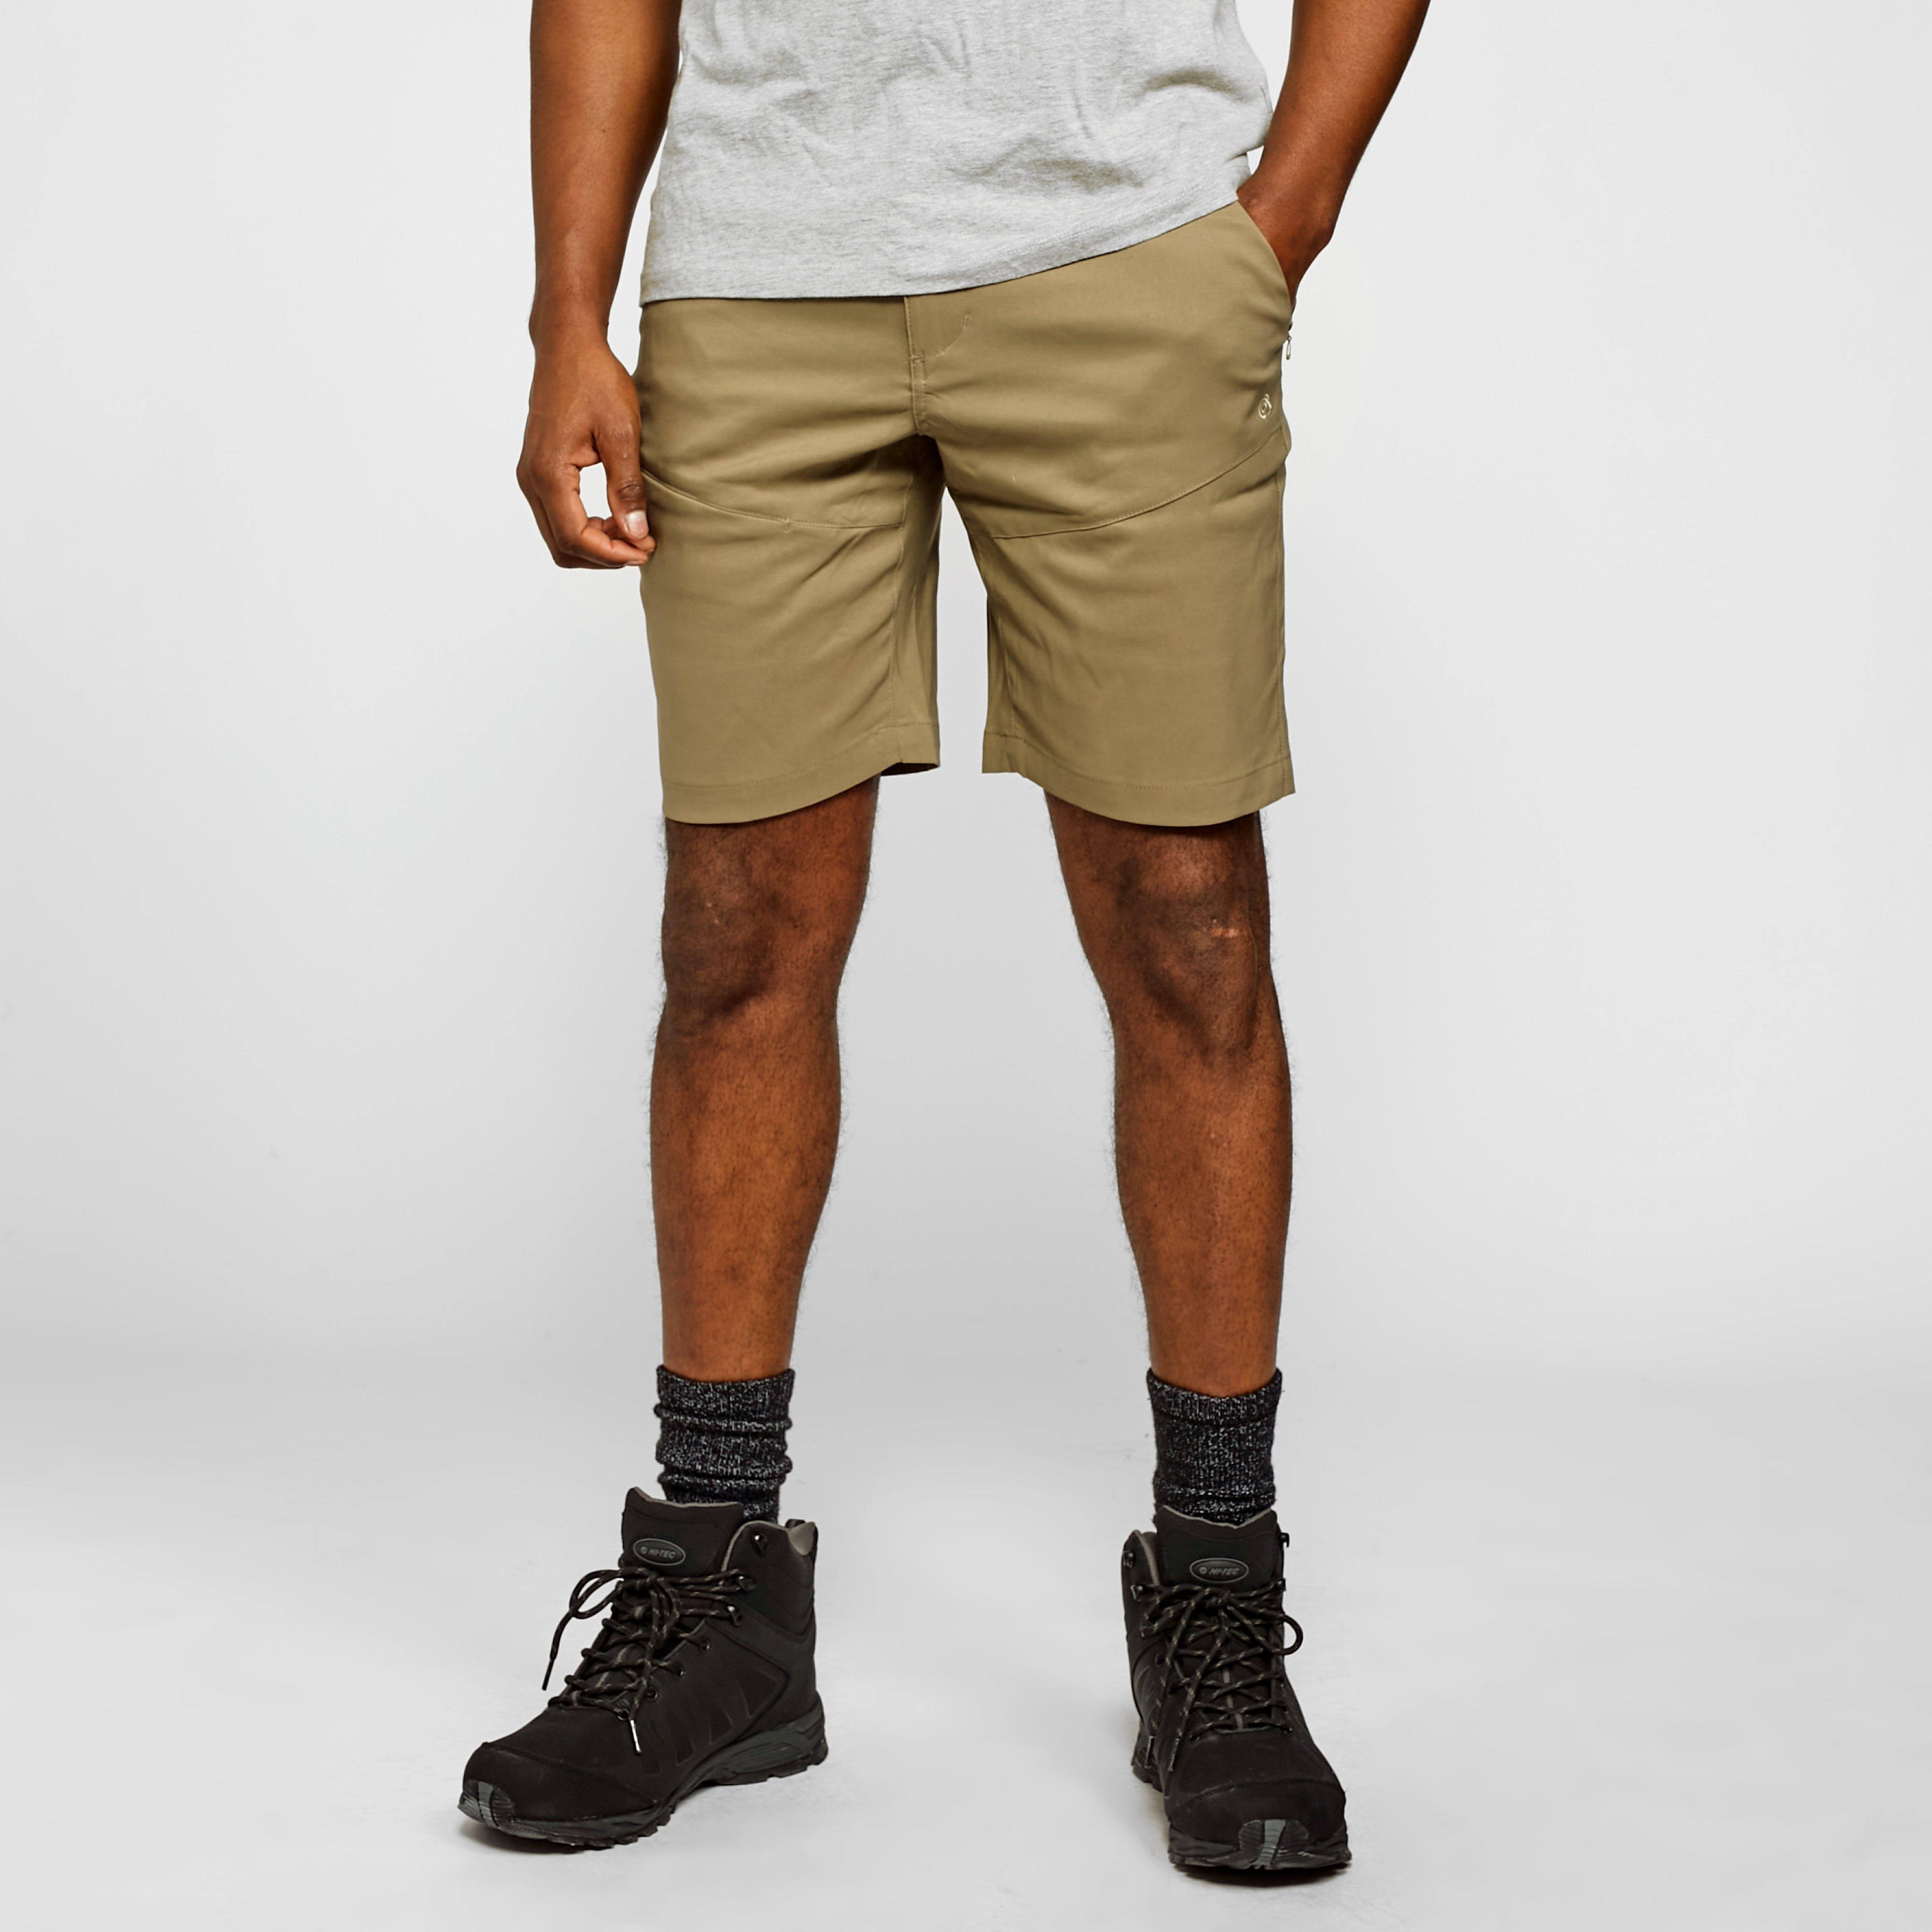 Craghoppers Men's Kiwi Pro Shorts, CREAM/CRM